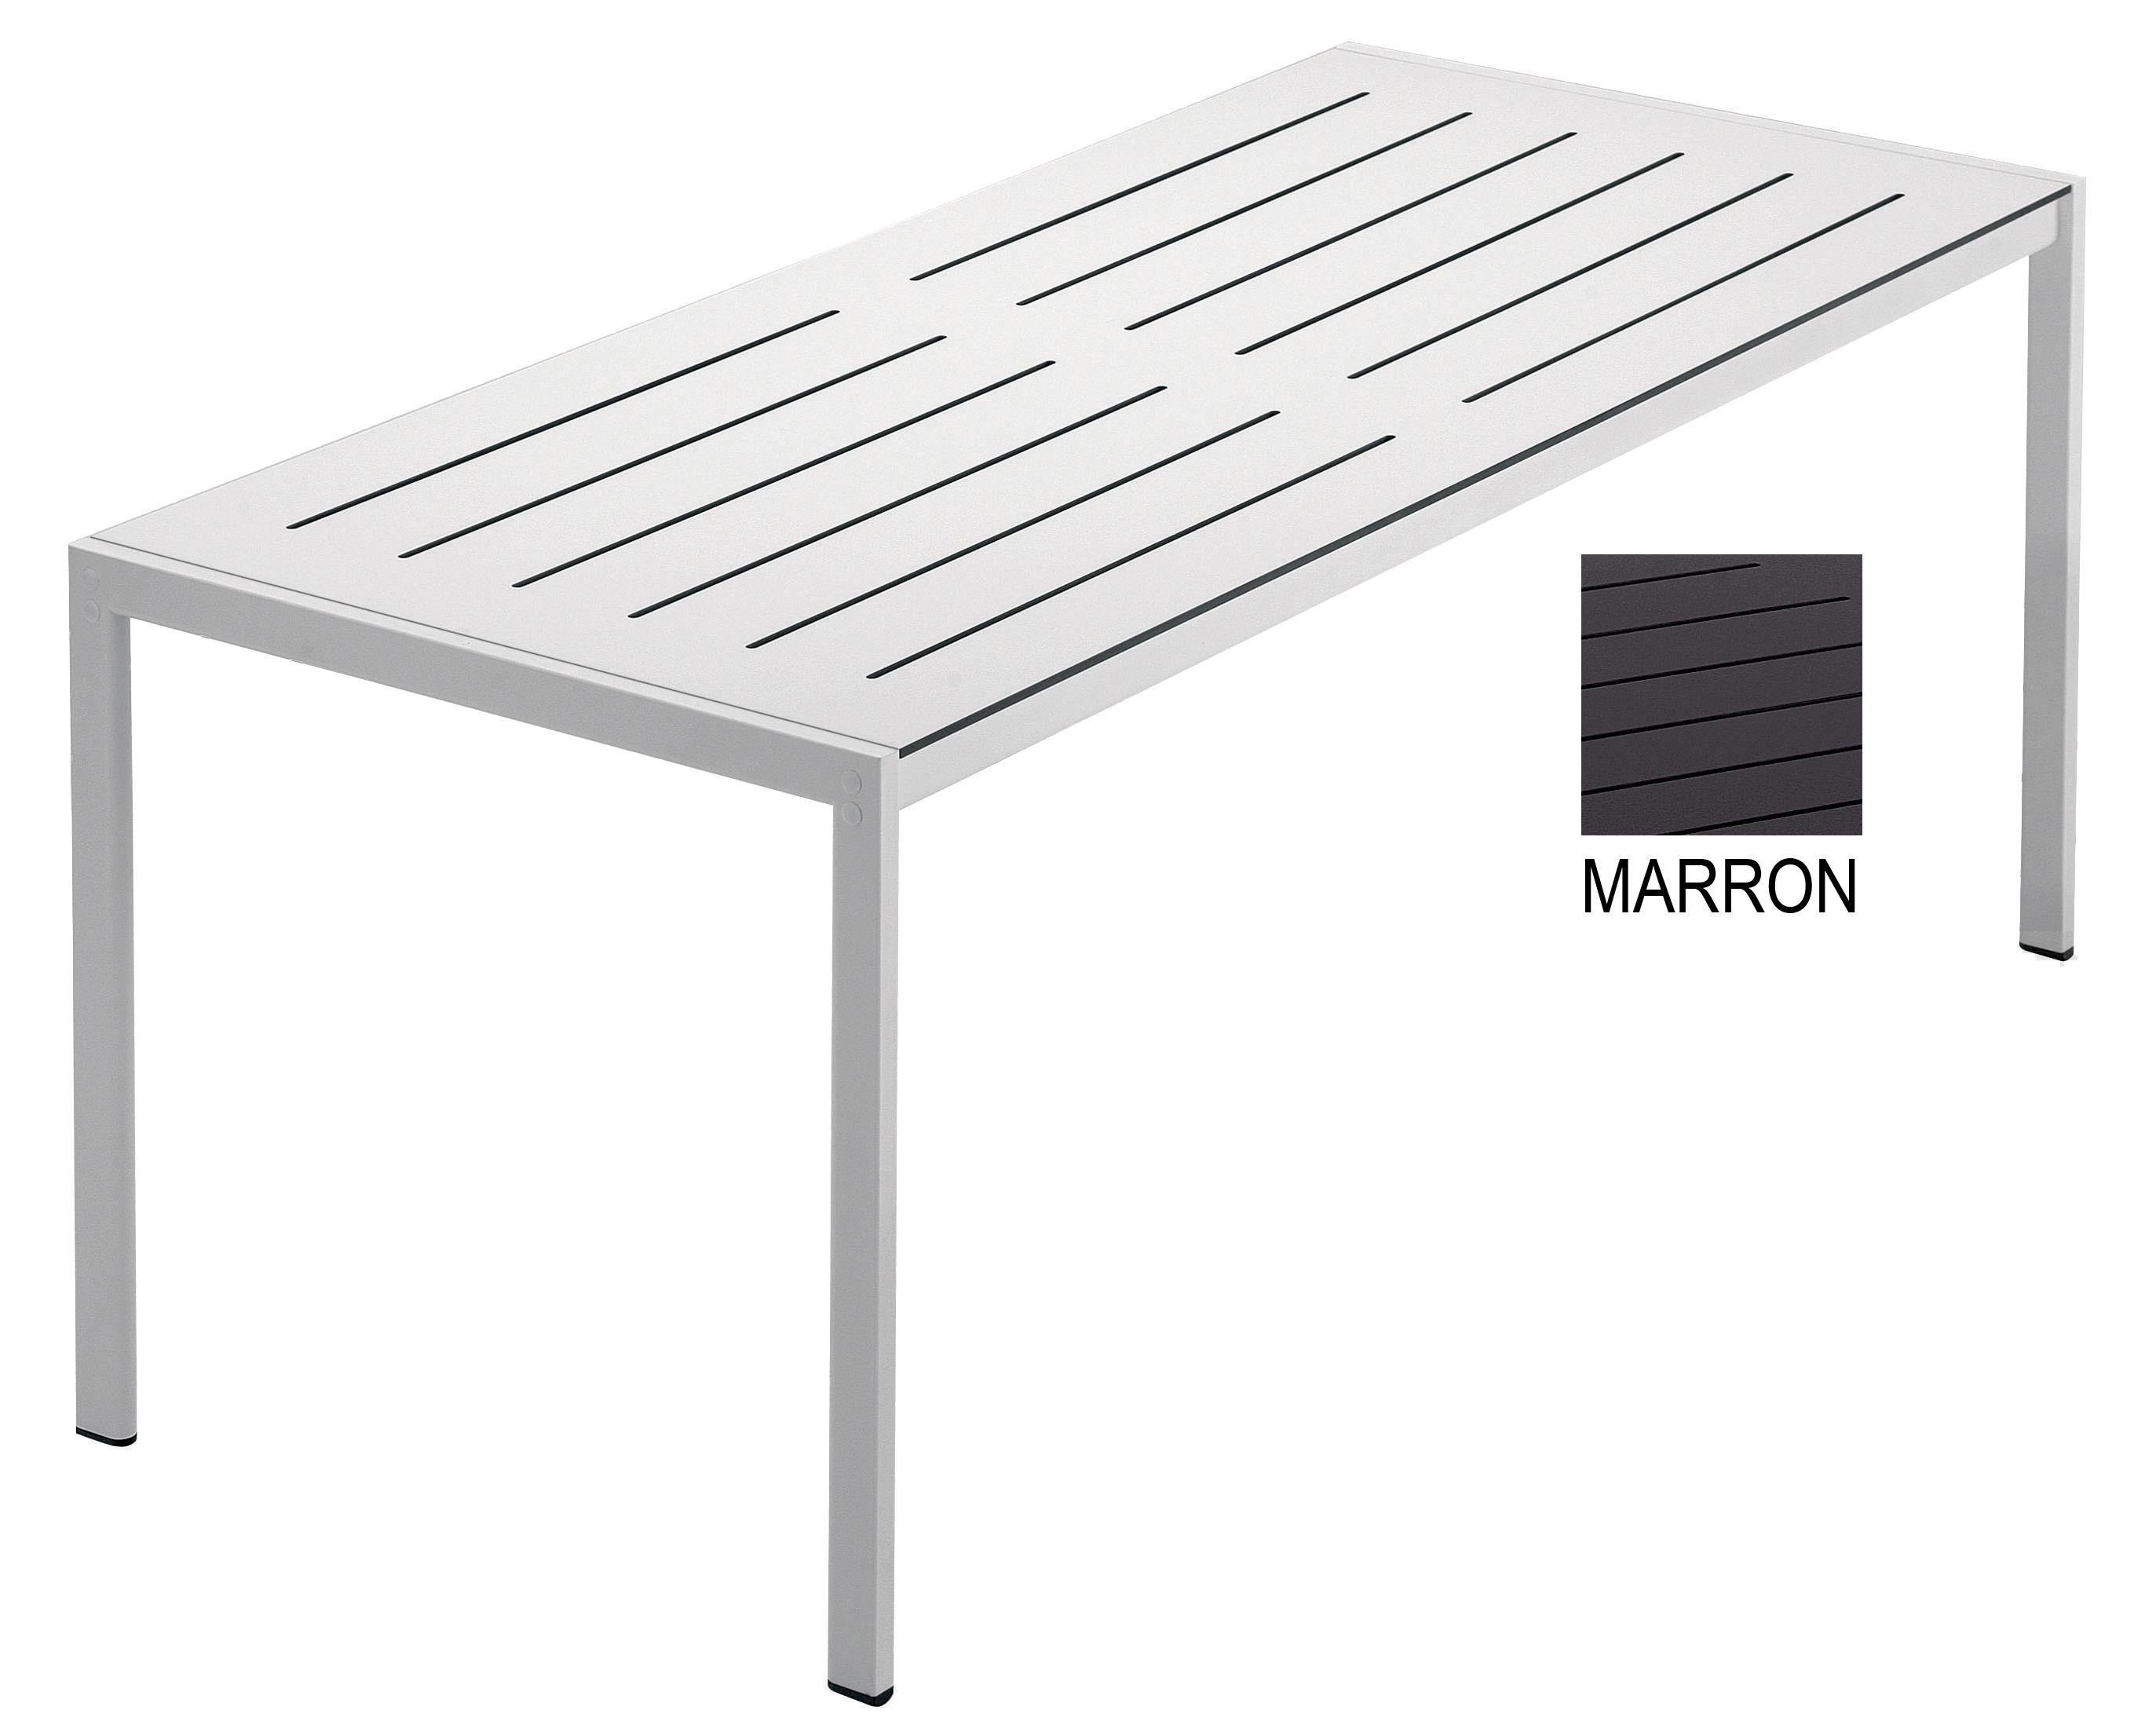 Table de jardin Sanmarco / 180 x 80 cm Marron - 80 x 180 cm ...